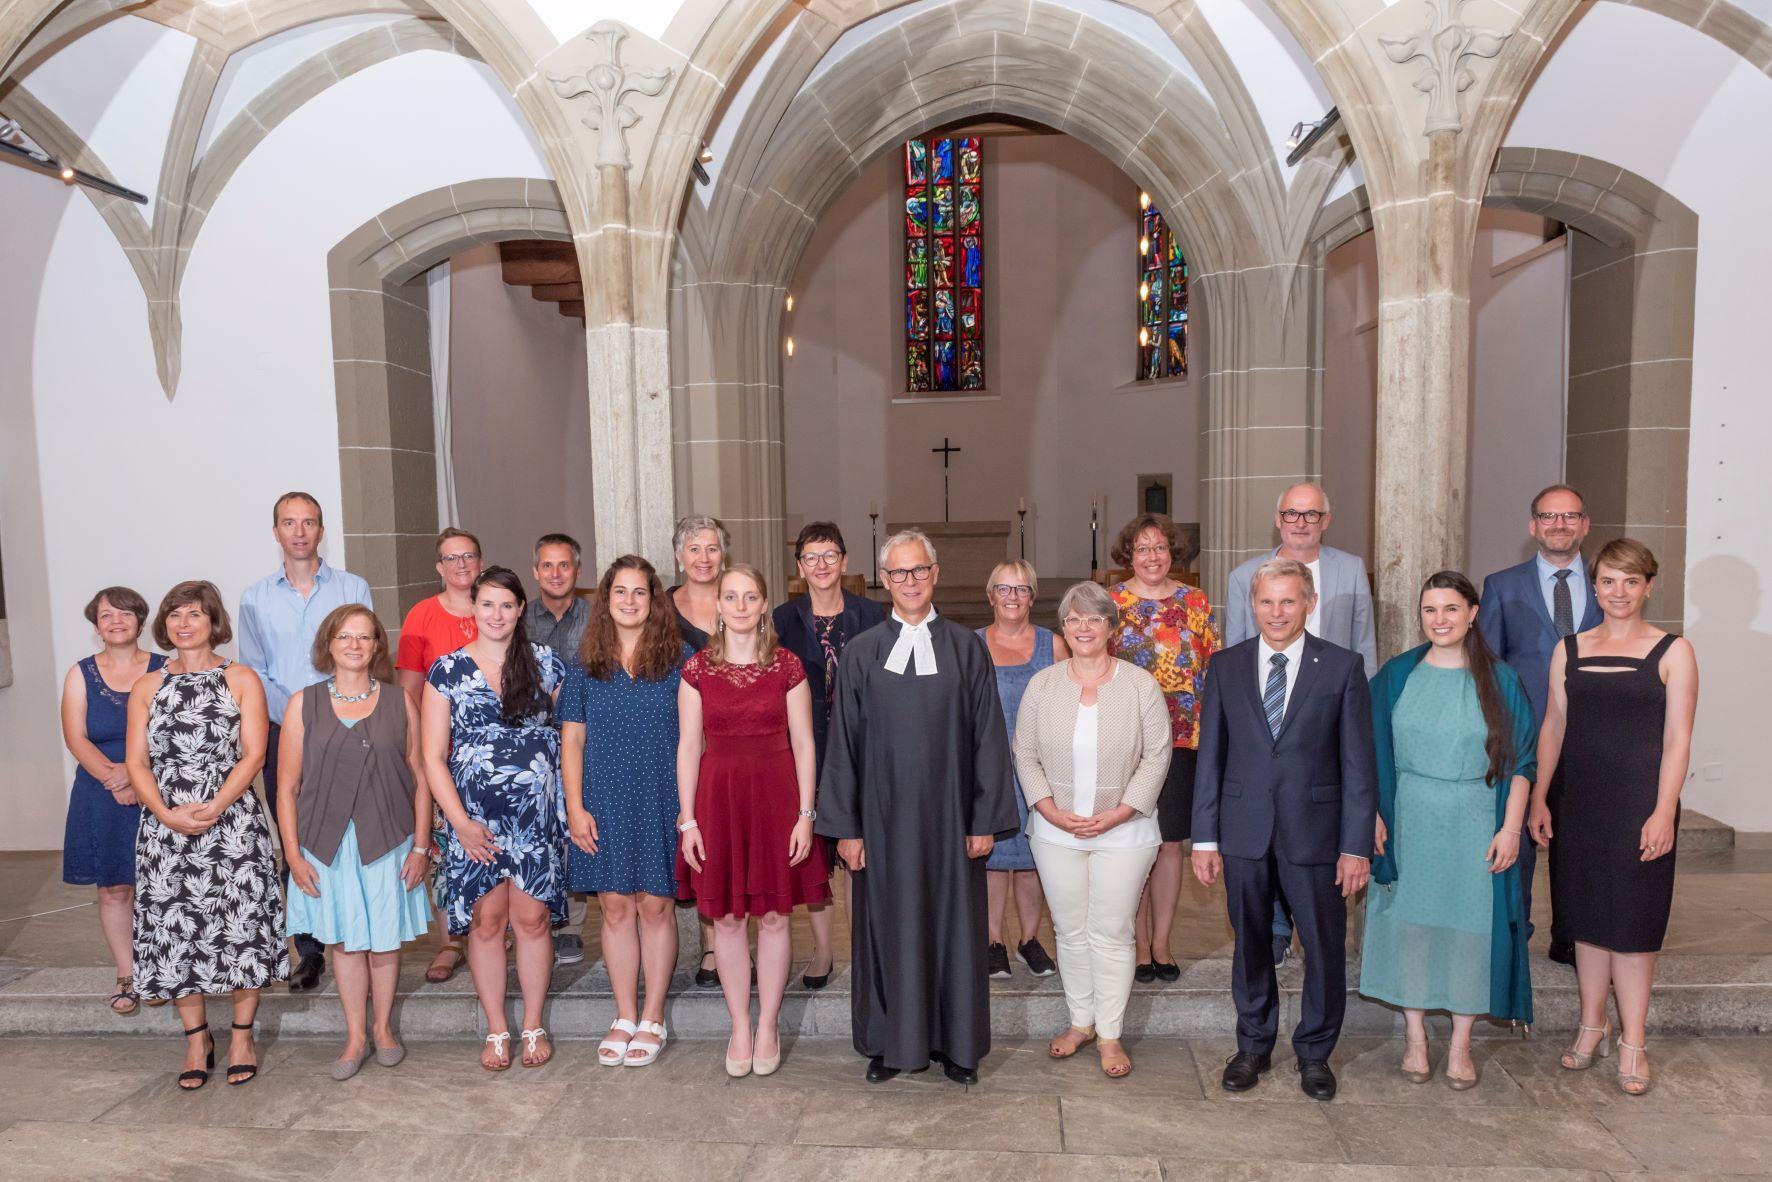 Ordination 15 Aug21 Aarau Gruppe Begleitpersonen Werner Rolli 1x